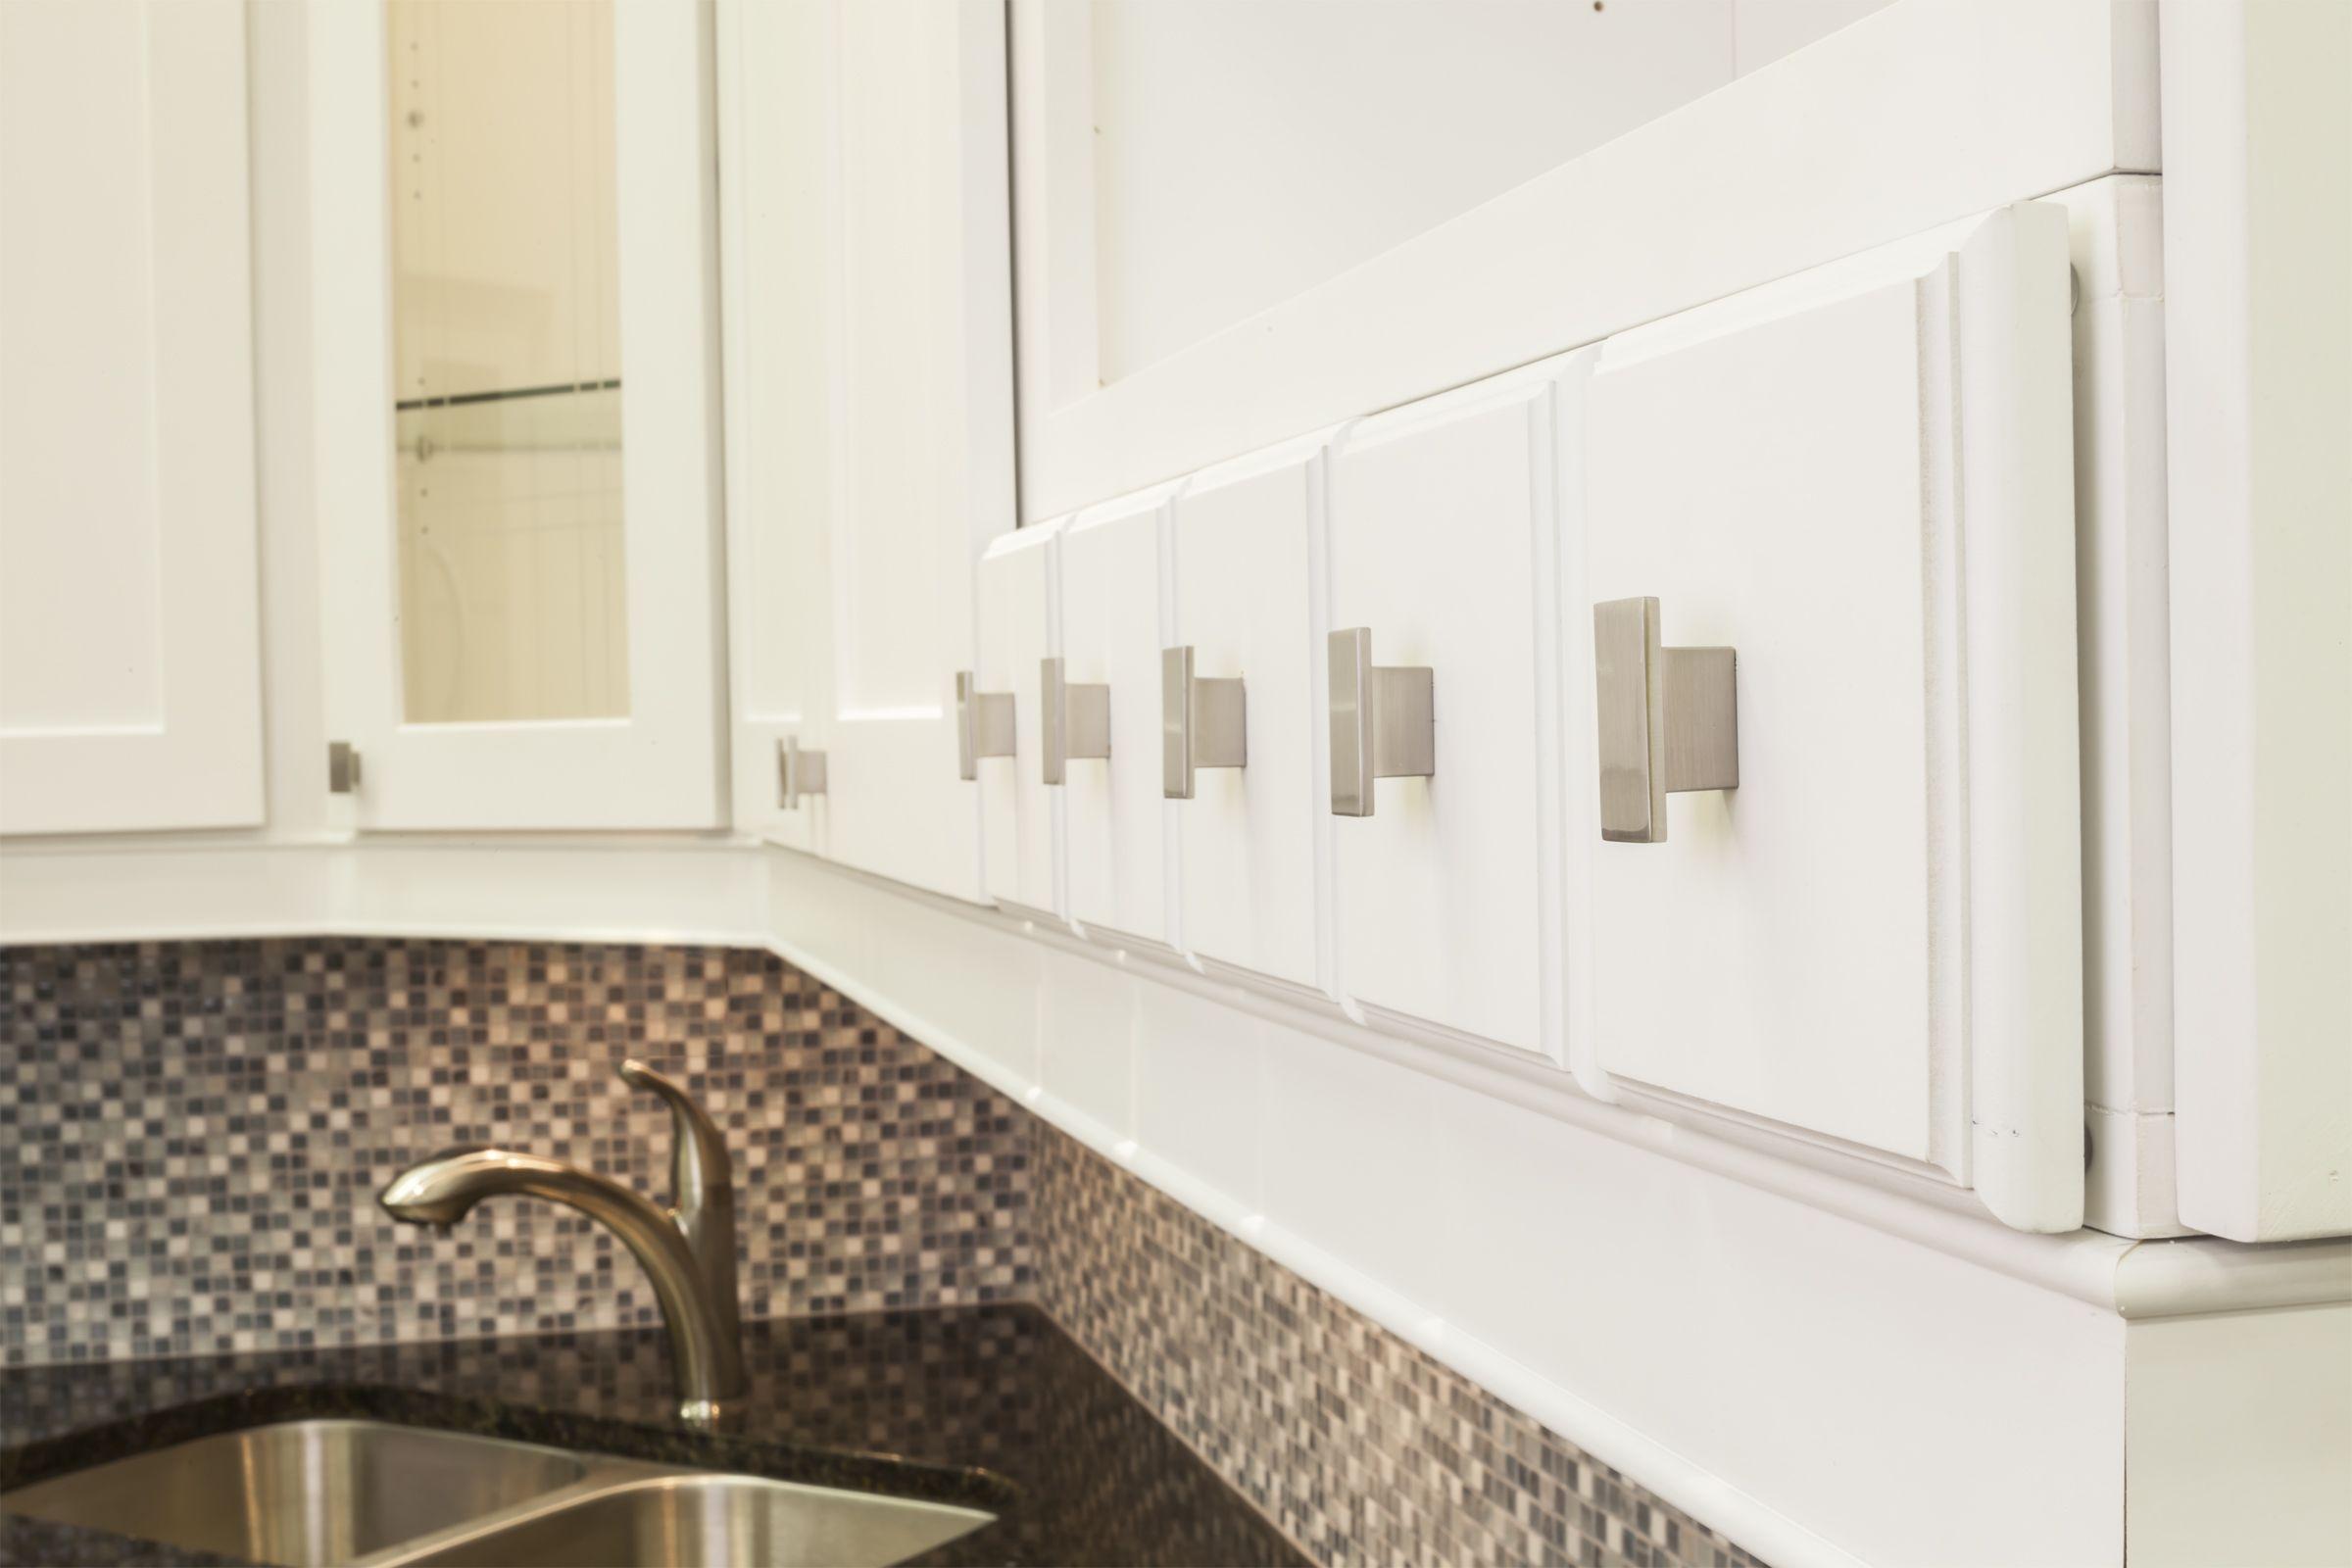 mirada cabinet knobs from jeffrey alexander by hardware resources 81021sn shown in use - Jeffrey Alexander Hardware